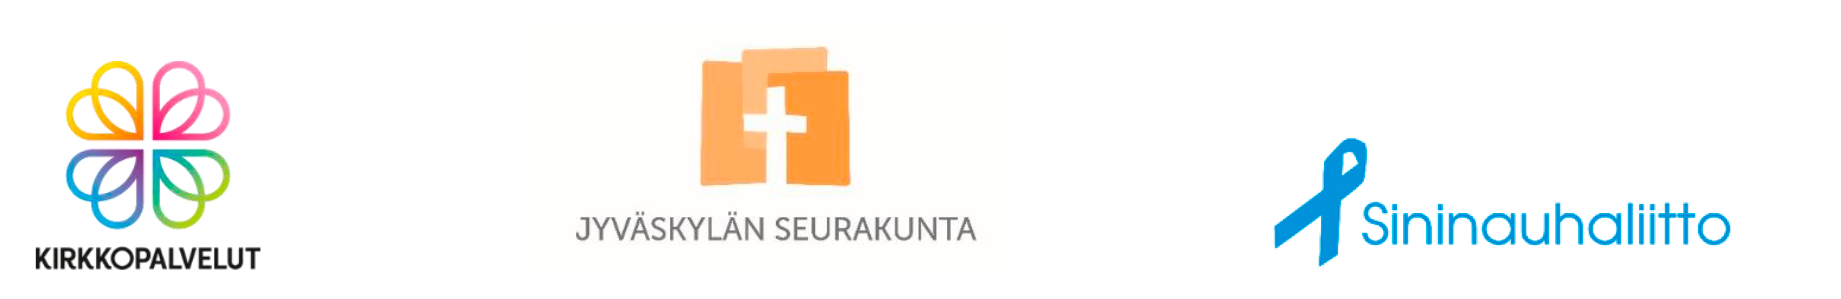 Organisaatioiden logot